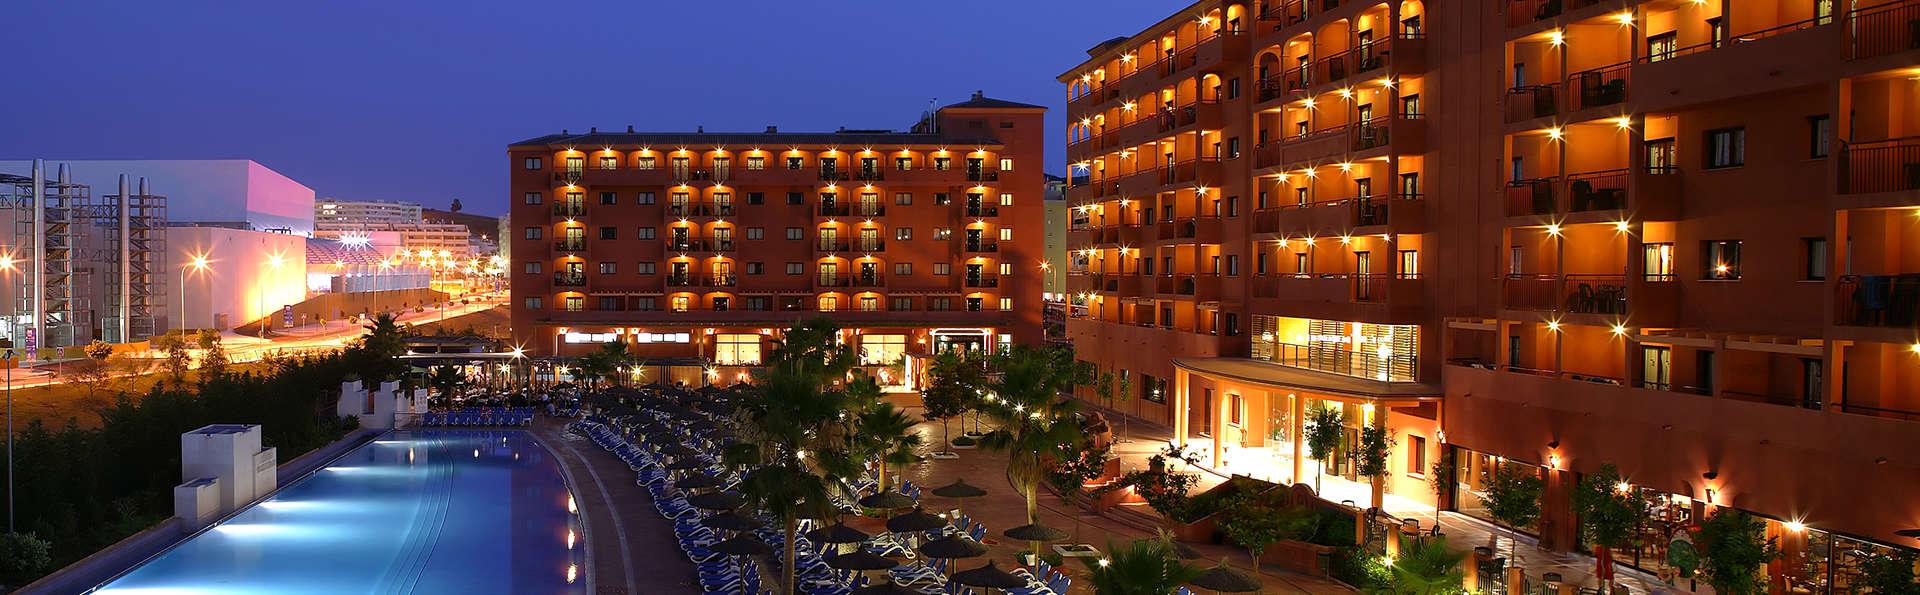 Aparthotel Myramar Fuengirola - Edit_view.jpg